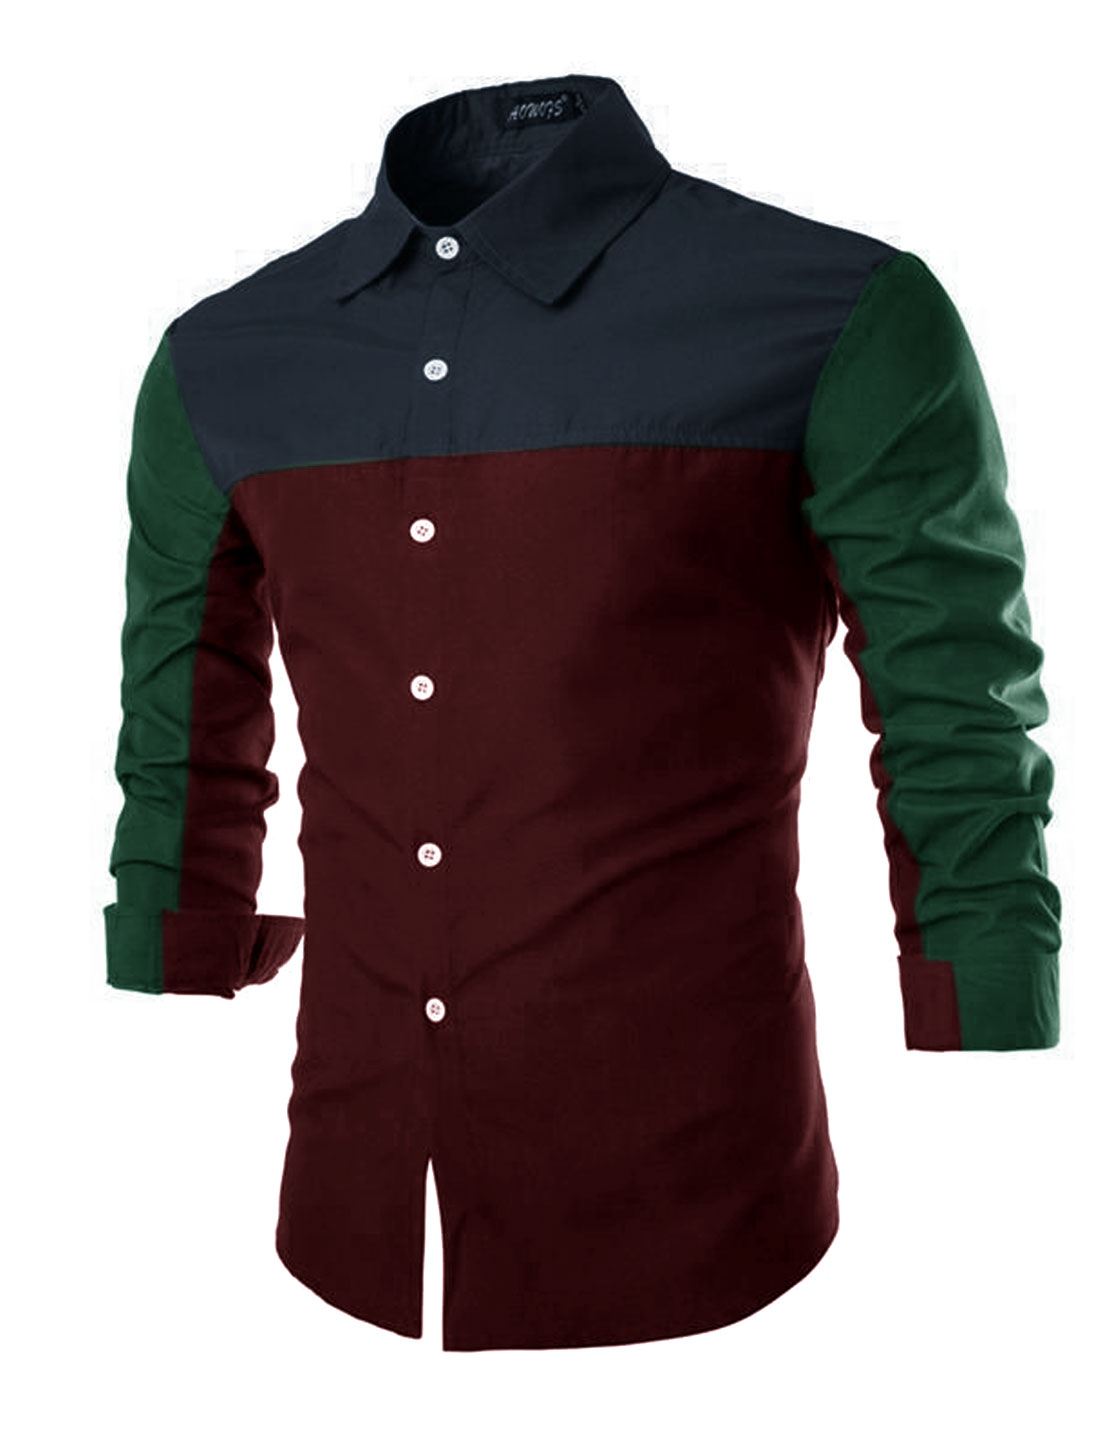 Men Button Cuffs Colour Contrast Casual Shirt Burgundys S